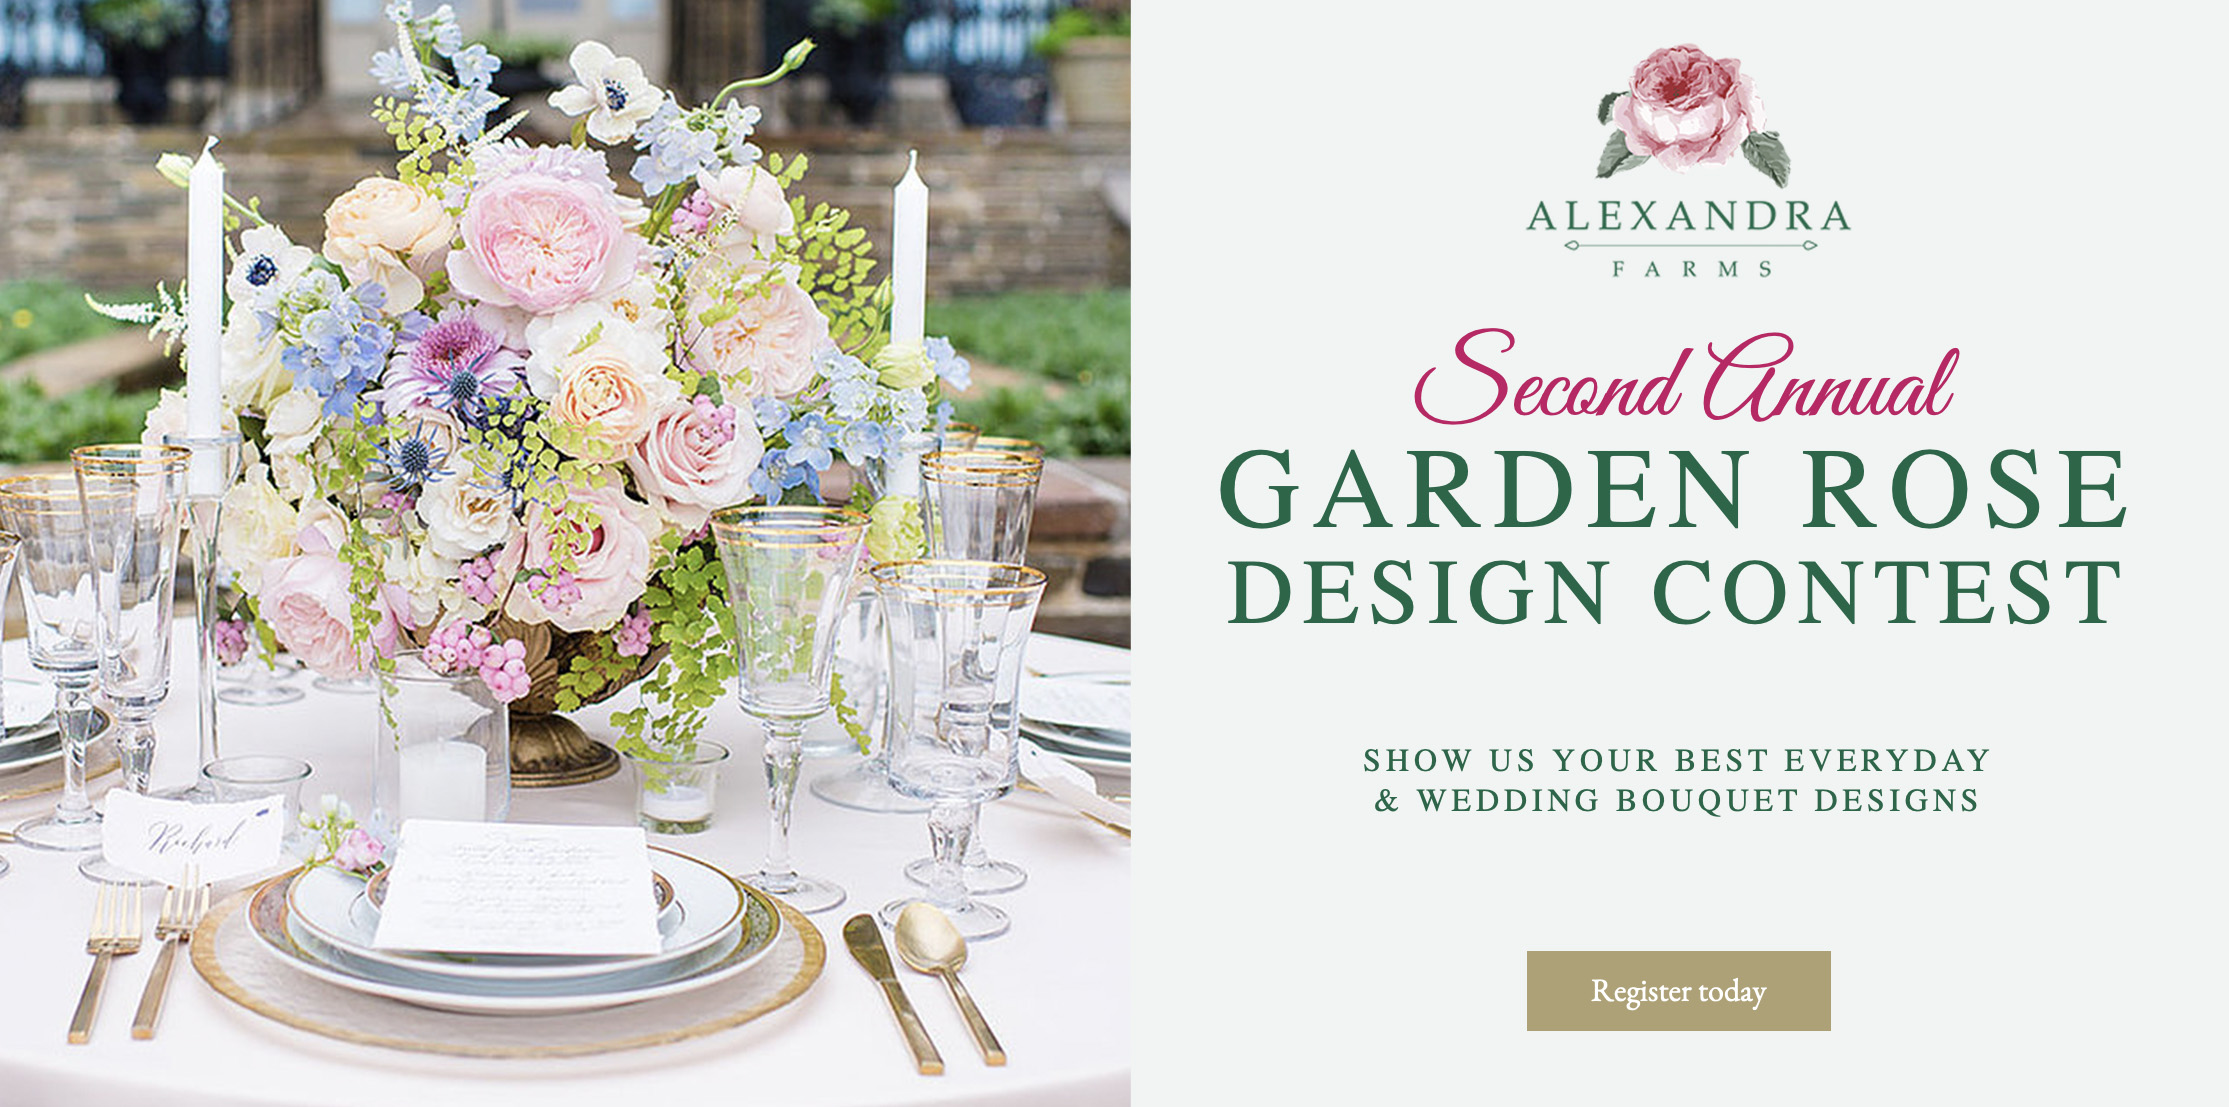 Alexandra Farms Second Annual Garden Rose Design Contest